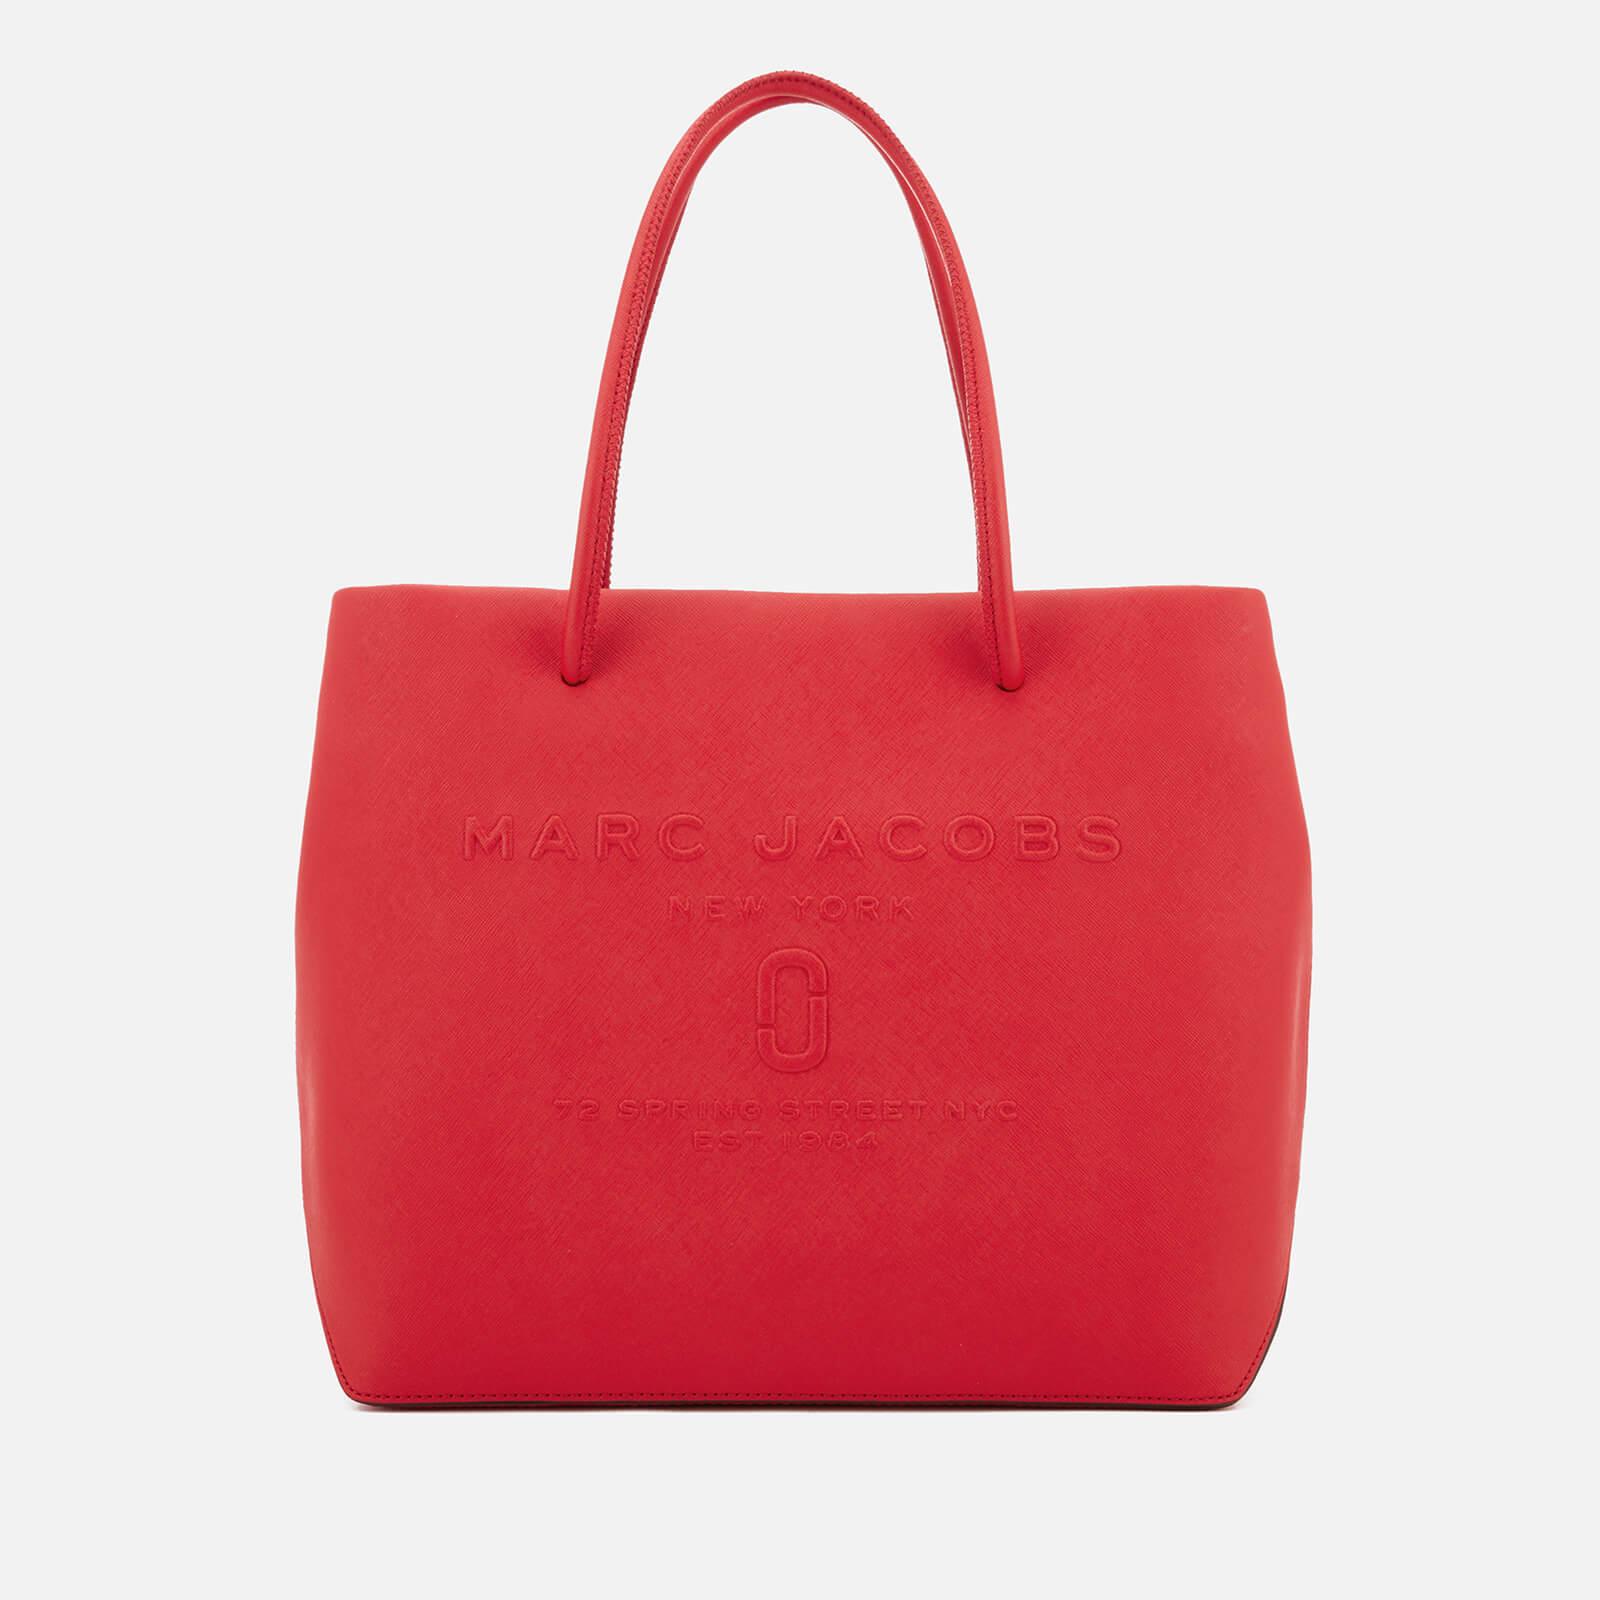 221b86d83af3 Marc Jacobs Women s Logo Shopper East West Tote Bag - Red Pepper - Free UK  Delivery over £50